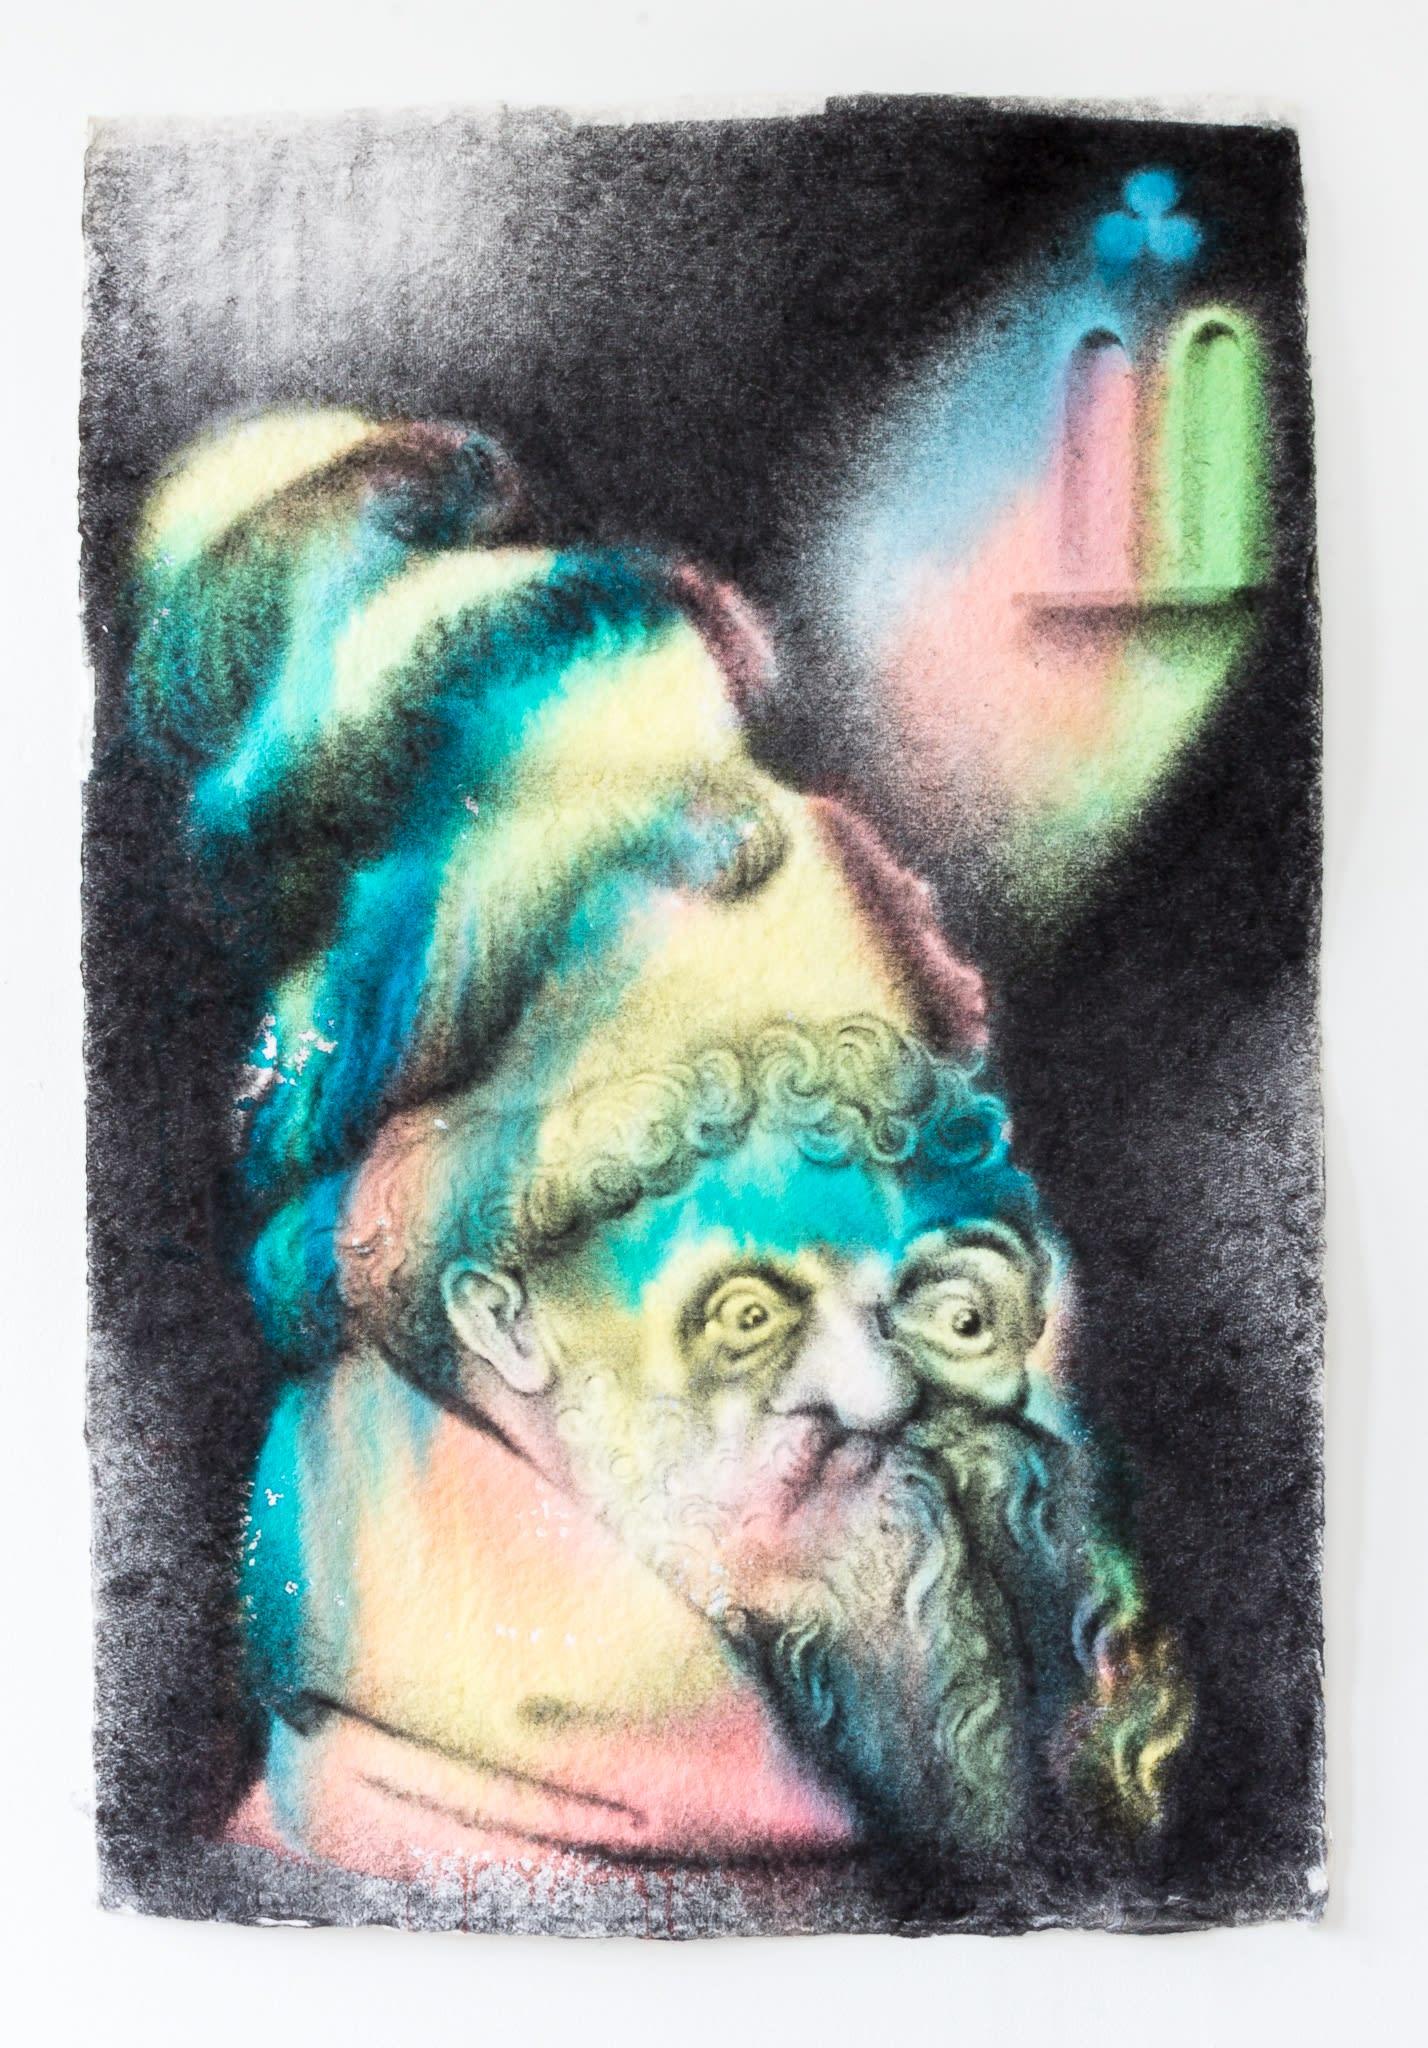 <span class=&#34;link fancybox-details-link&#34;><a href=&#34;/exhibitions/98/works/image2080/&#34;>View Detail Page</a></span><div id=&#34;artwork-panel-details&#34; class=&#34;standard-artwork-details&#34;><div class=&#34;artist&#34;><strong>Robert McNally</strong></div><div class=&#34;title&#34;><em>Roger Bacon</em>, 2017</div><div class=&#34;medium&#34;>Graphite powder & watercolour on handmade 1200g paper</div><div class=&#34;dimensions&#34;>101.9 x 68.5 cm<br /> 40 1/8 x 27 in</div></div>